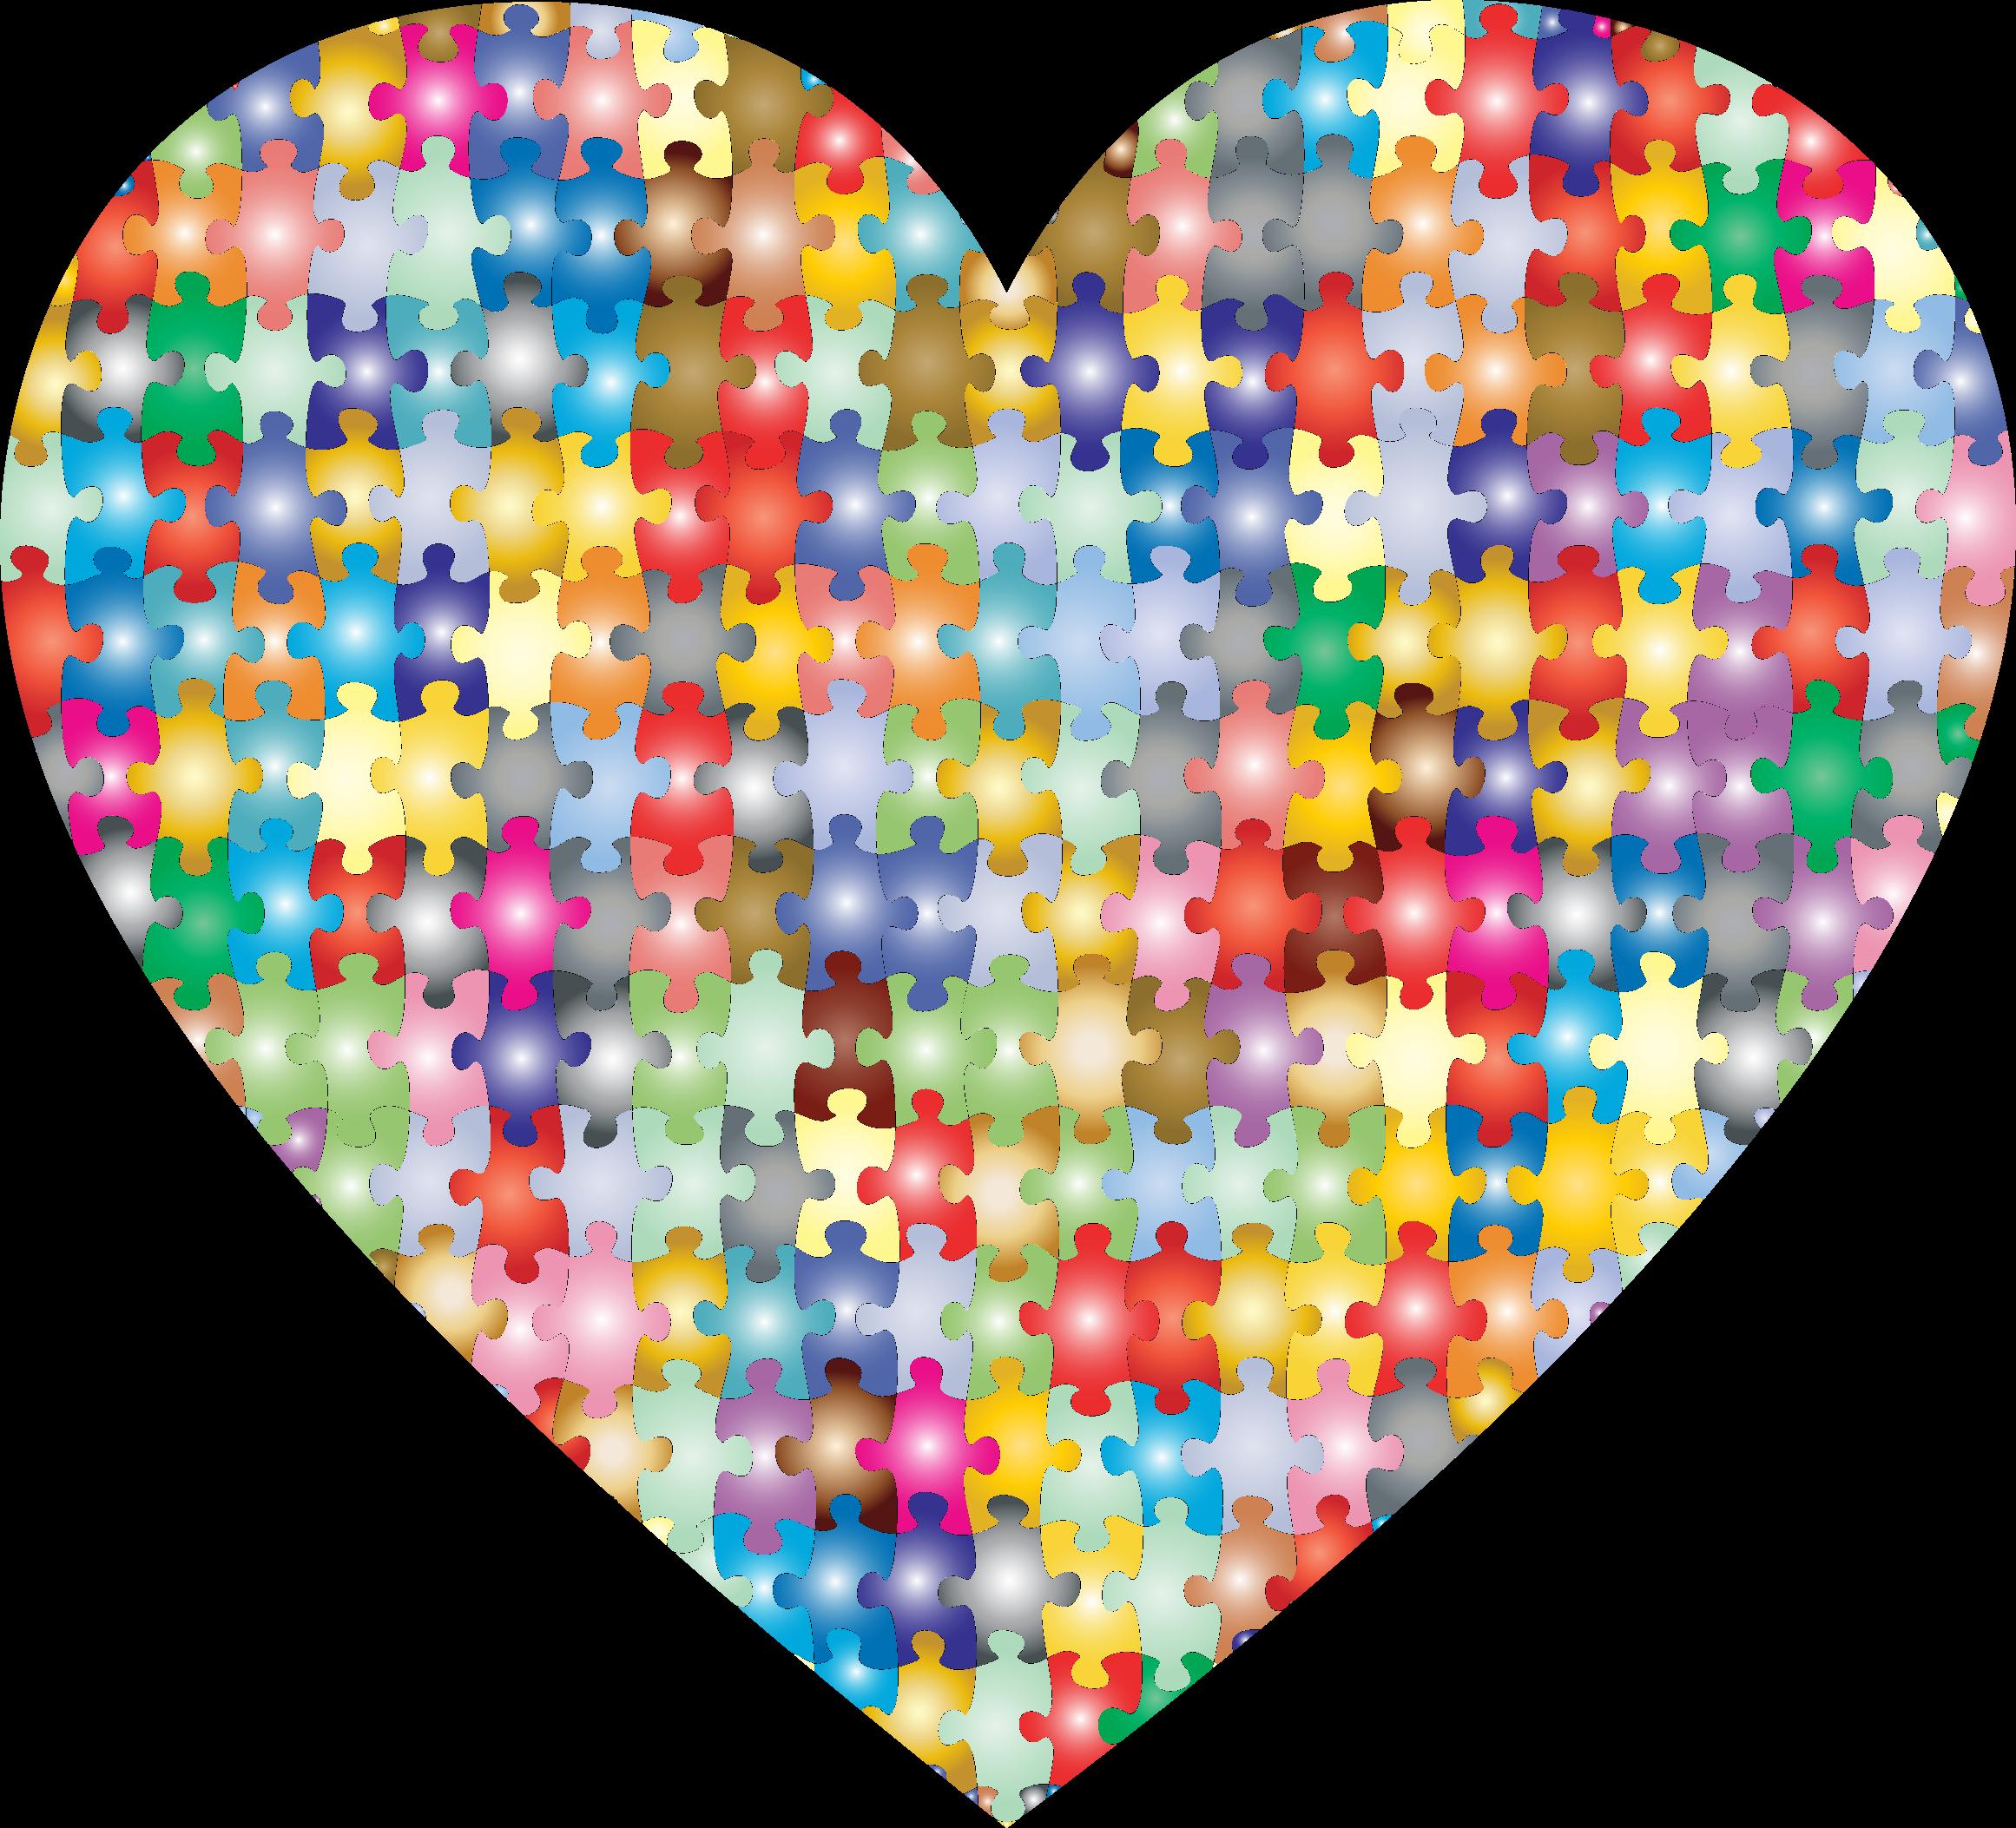 Heart inside a heart clipart svg library library Clipart - Colorful Puzzle Heart 3 svg library library